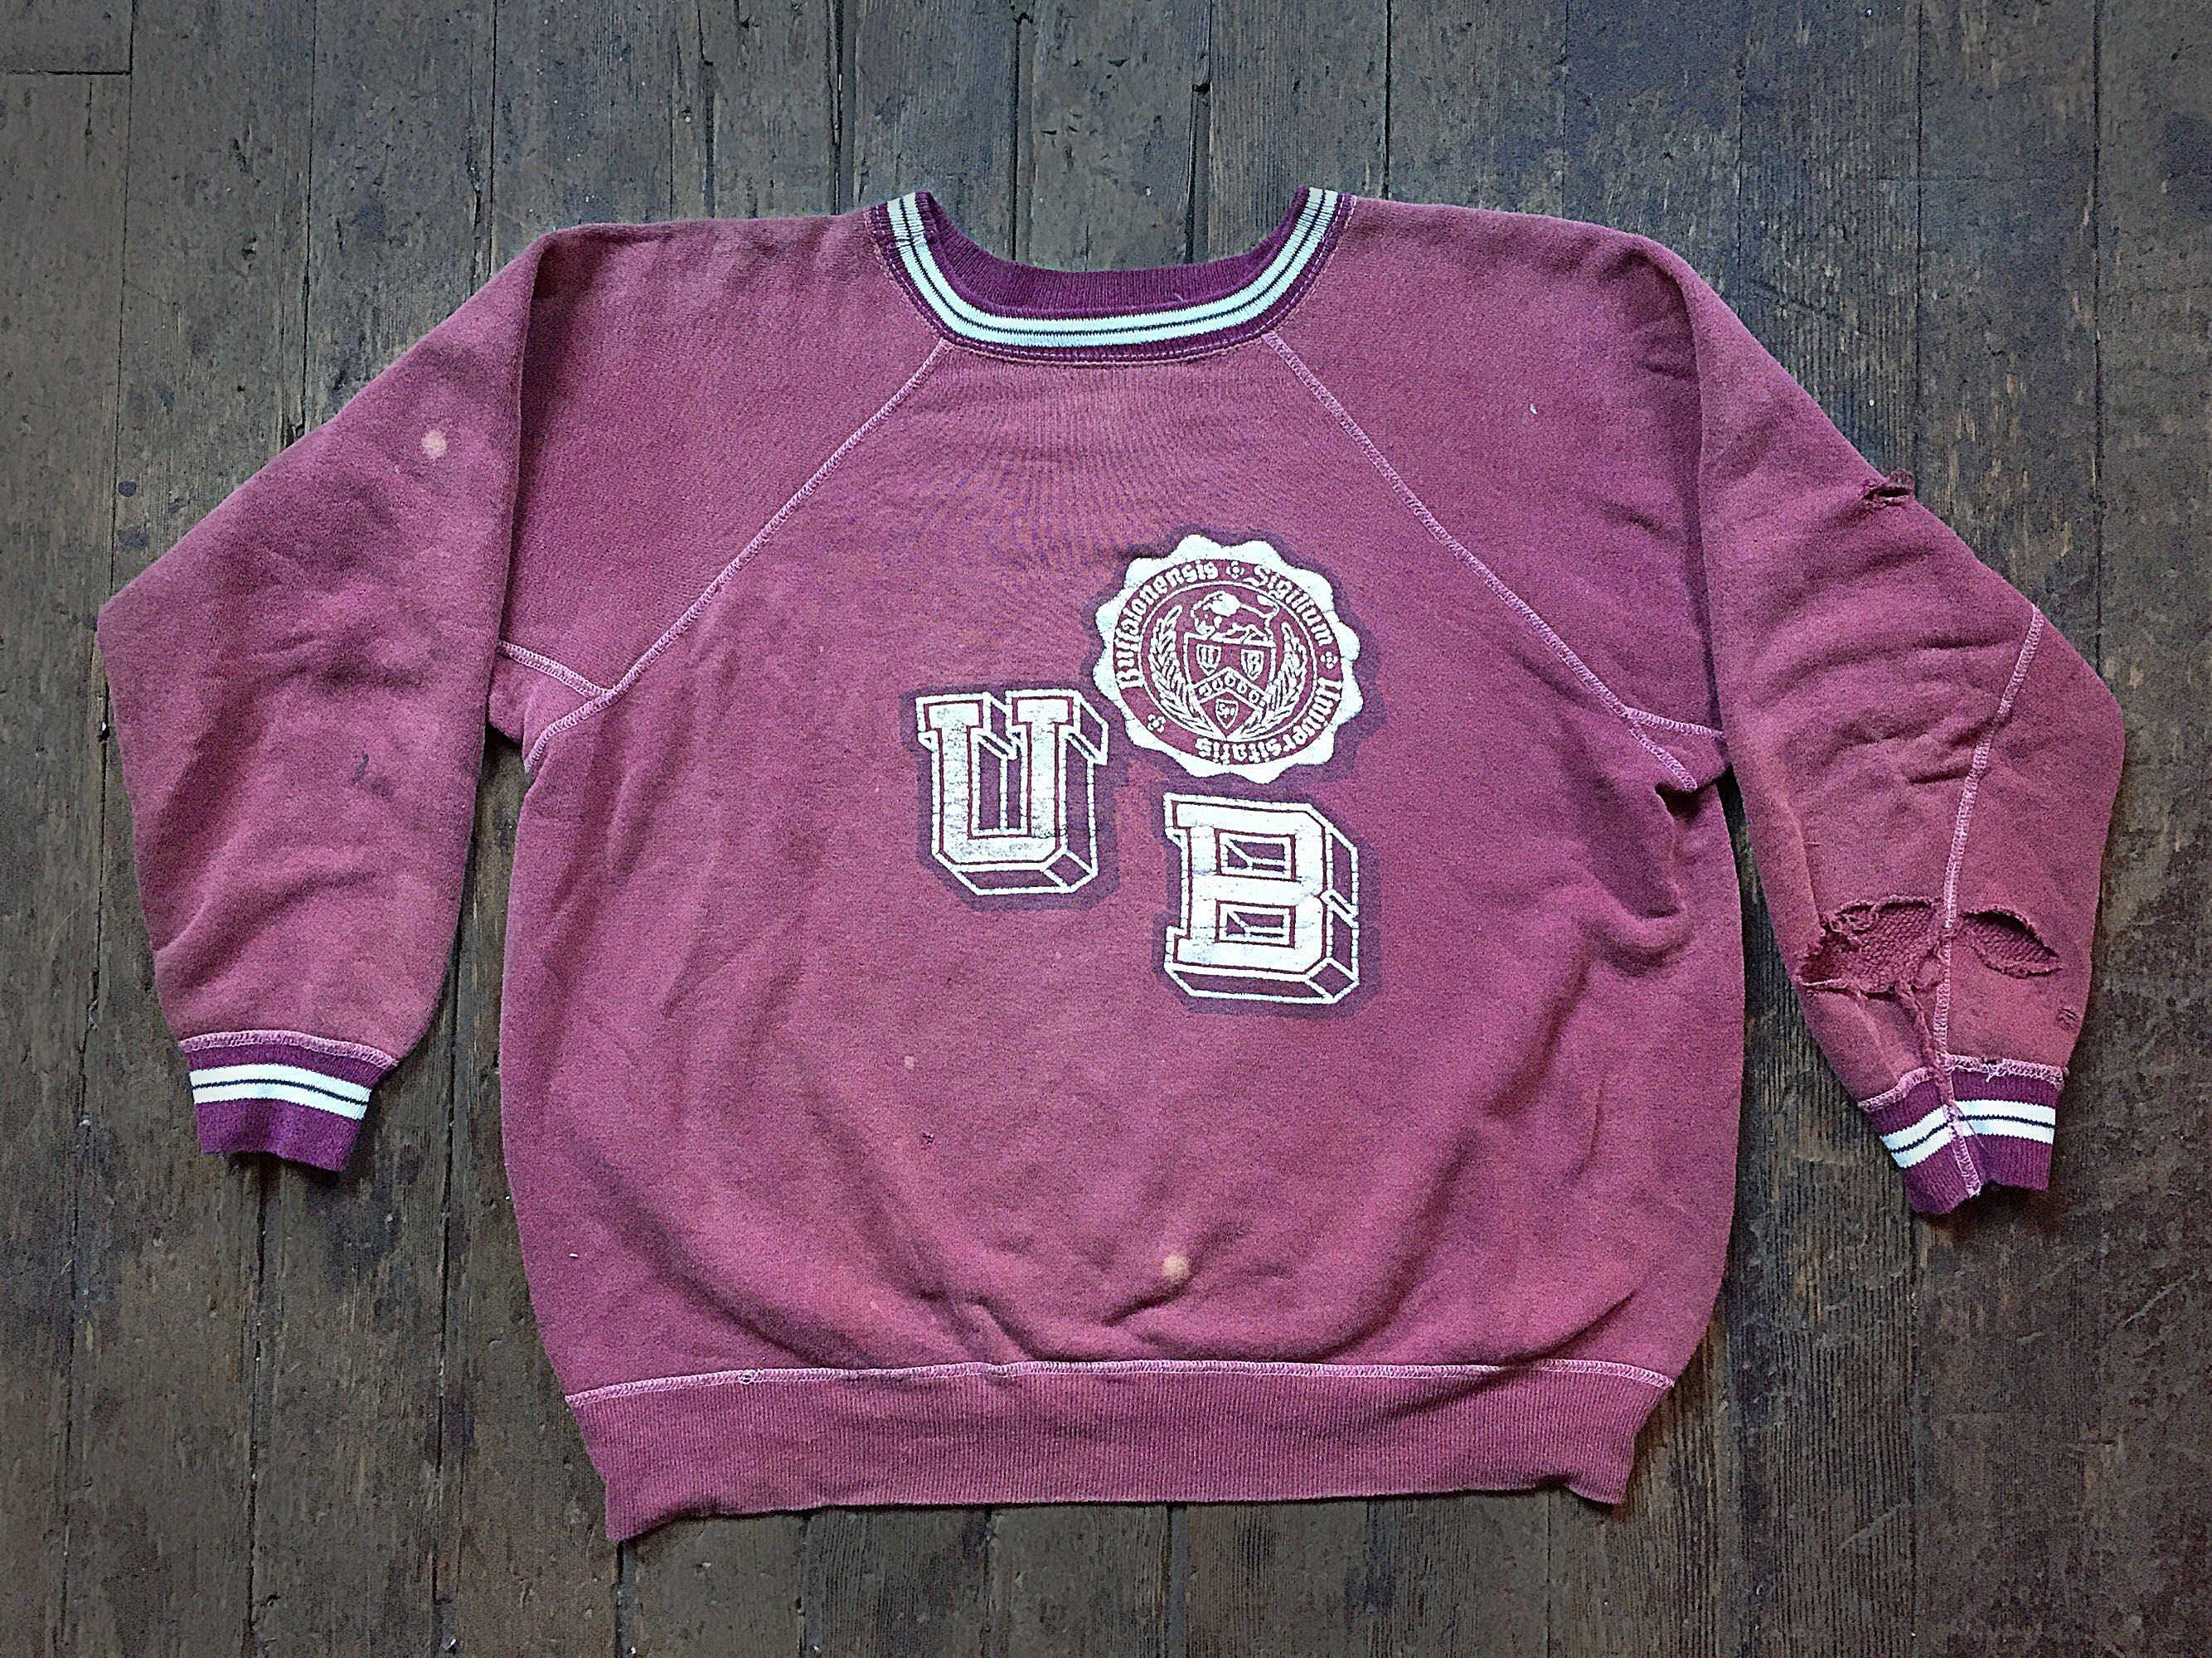 promo code cc5e2 d6841 SHOP SALE // 1950s University Of Buffalo - State university of New York  Raglan reverse weave U of B pull over sweat shirt